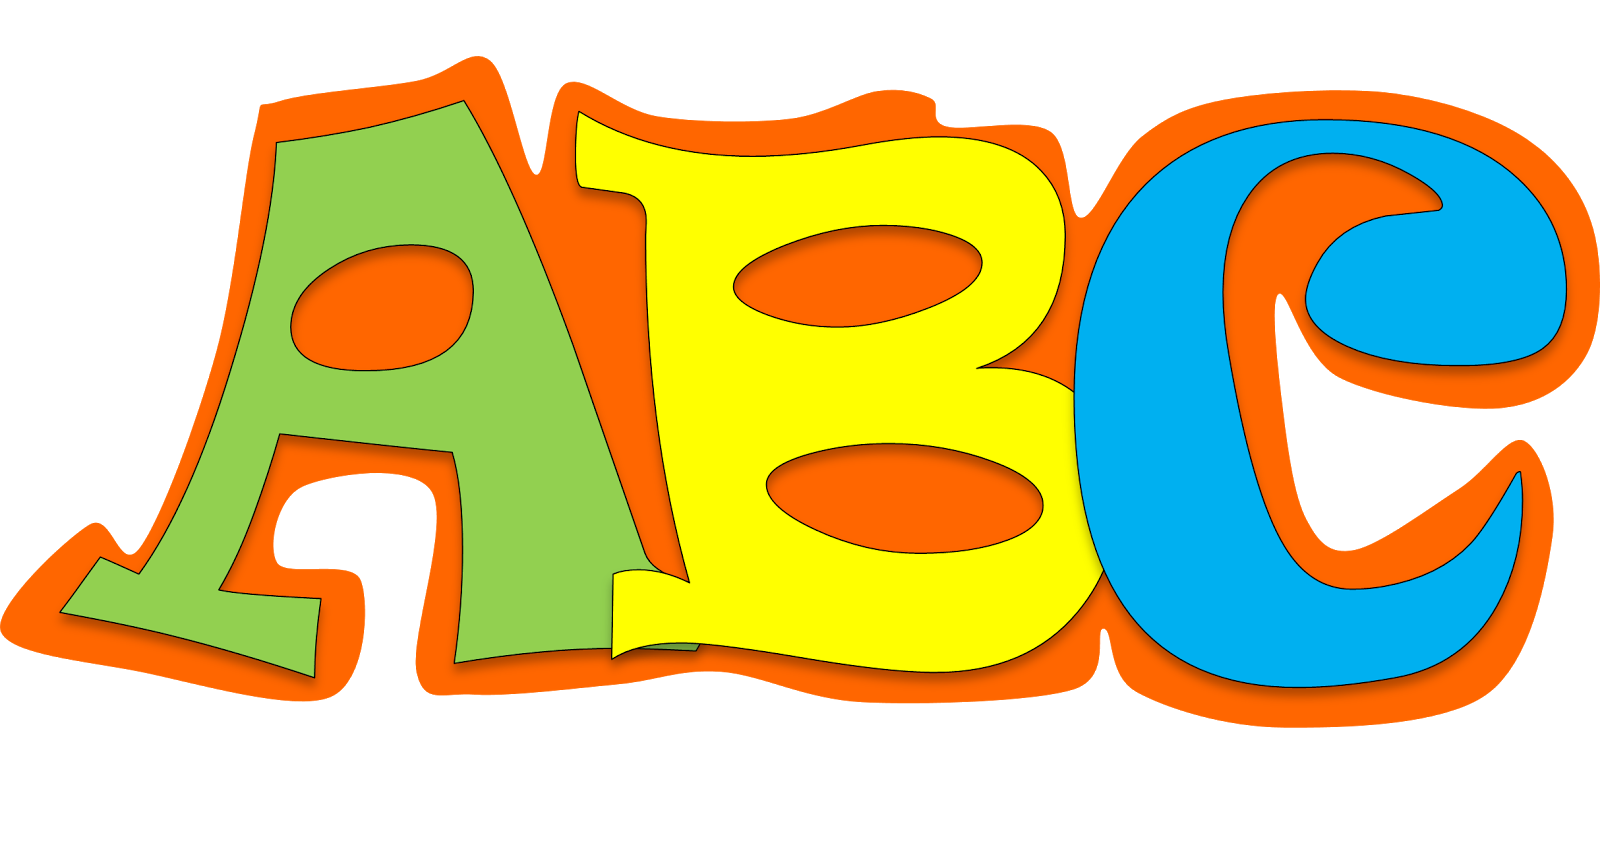 ABC clipart Free-ABC clipart Free-5